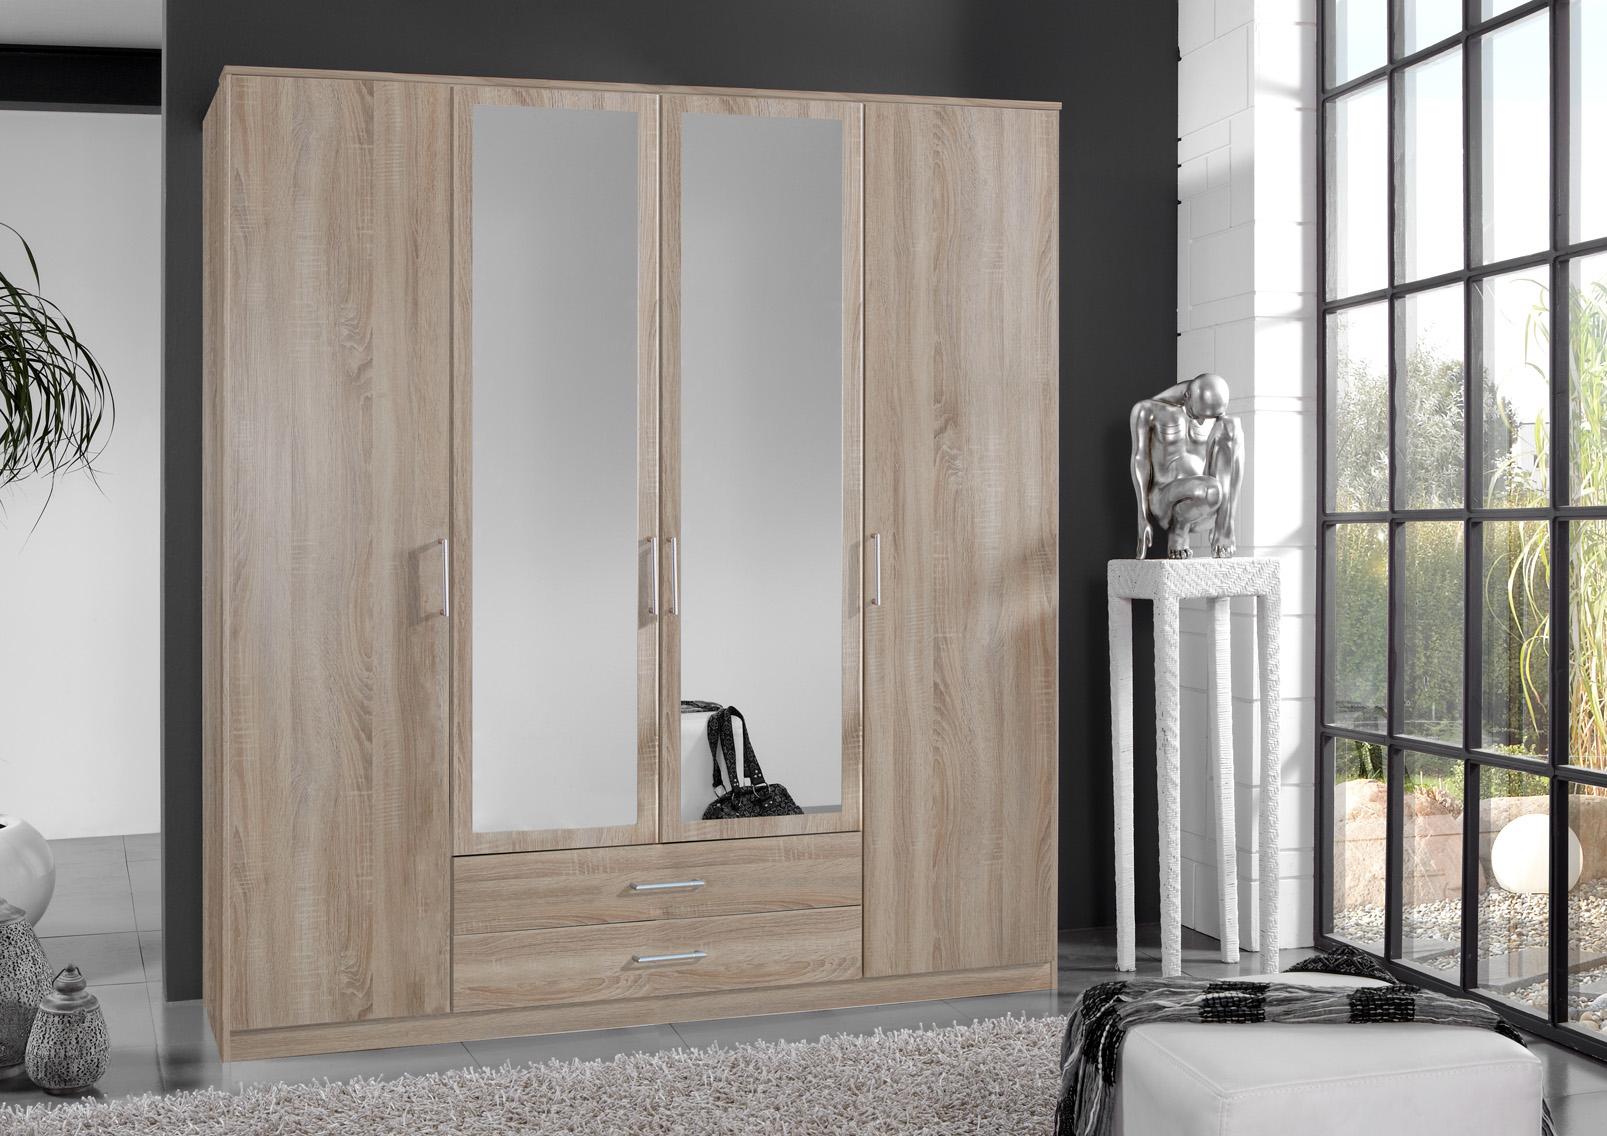 Armoire contemporaine 4 portes/2 tiroirs coloris chêne Carola